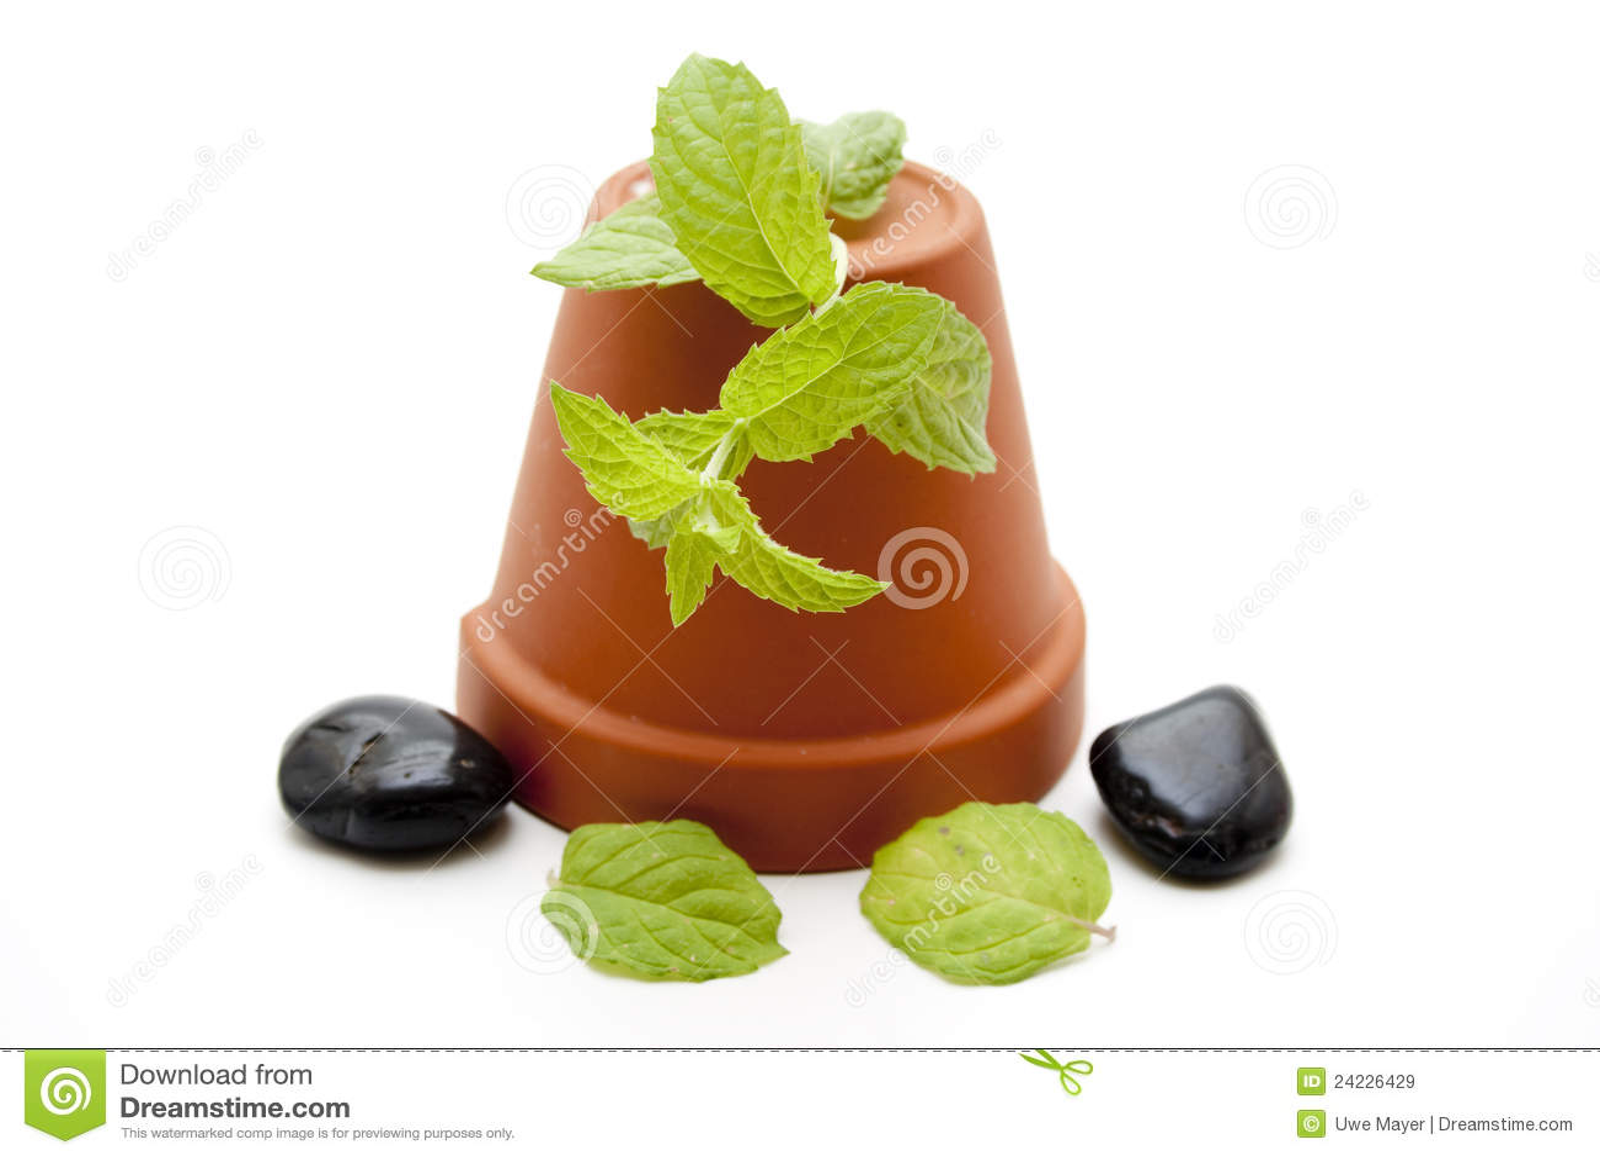 sonnenblumen pflanzen im flowerpot lizenzfreie stockbilder bild 24226429. Black Bedroom Furniture Sets. Home Design Ideas